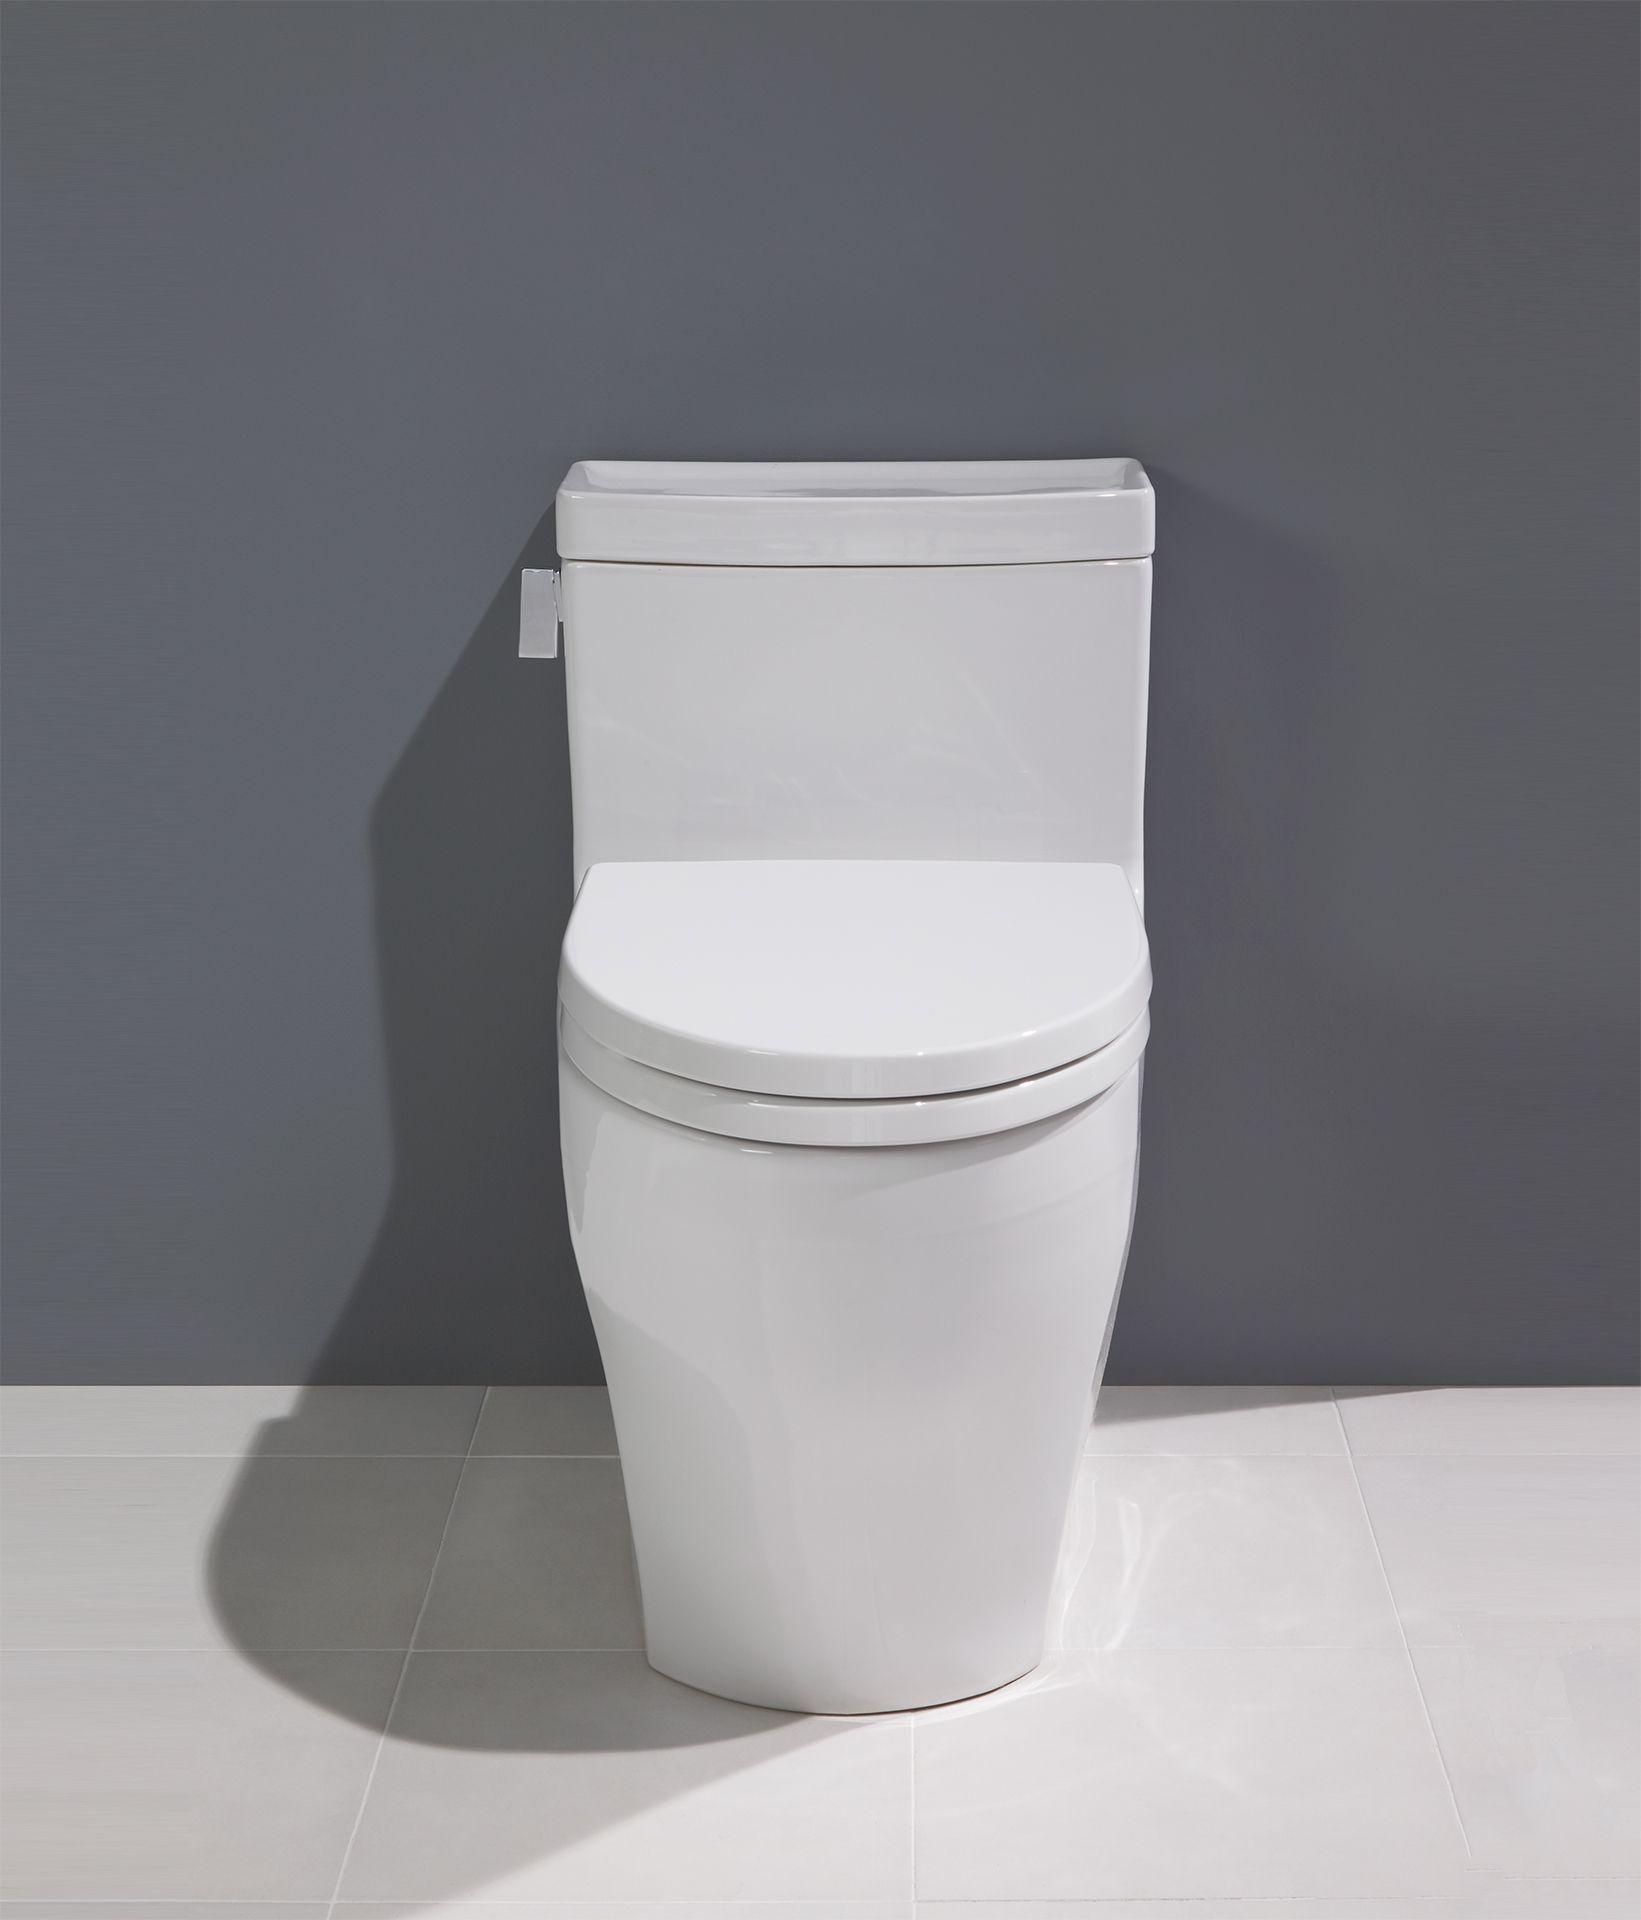 Toto Legato One Piece Toilet 1 28gpf Elongated Bowl